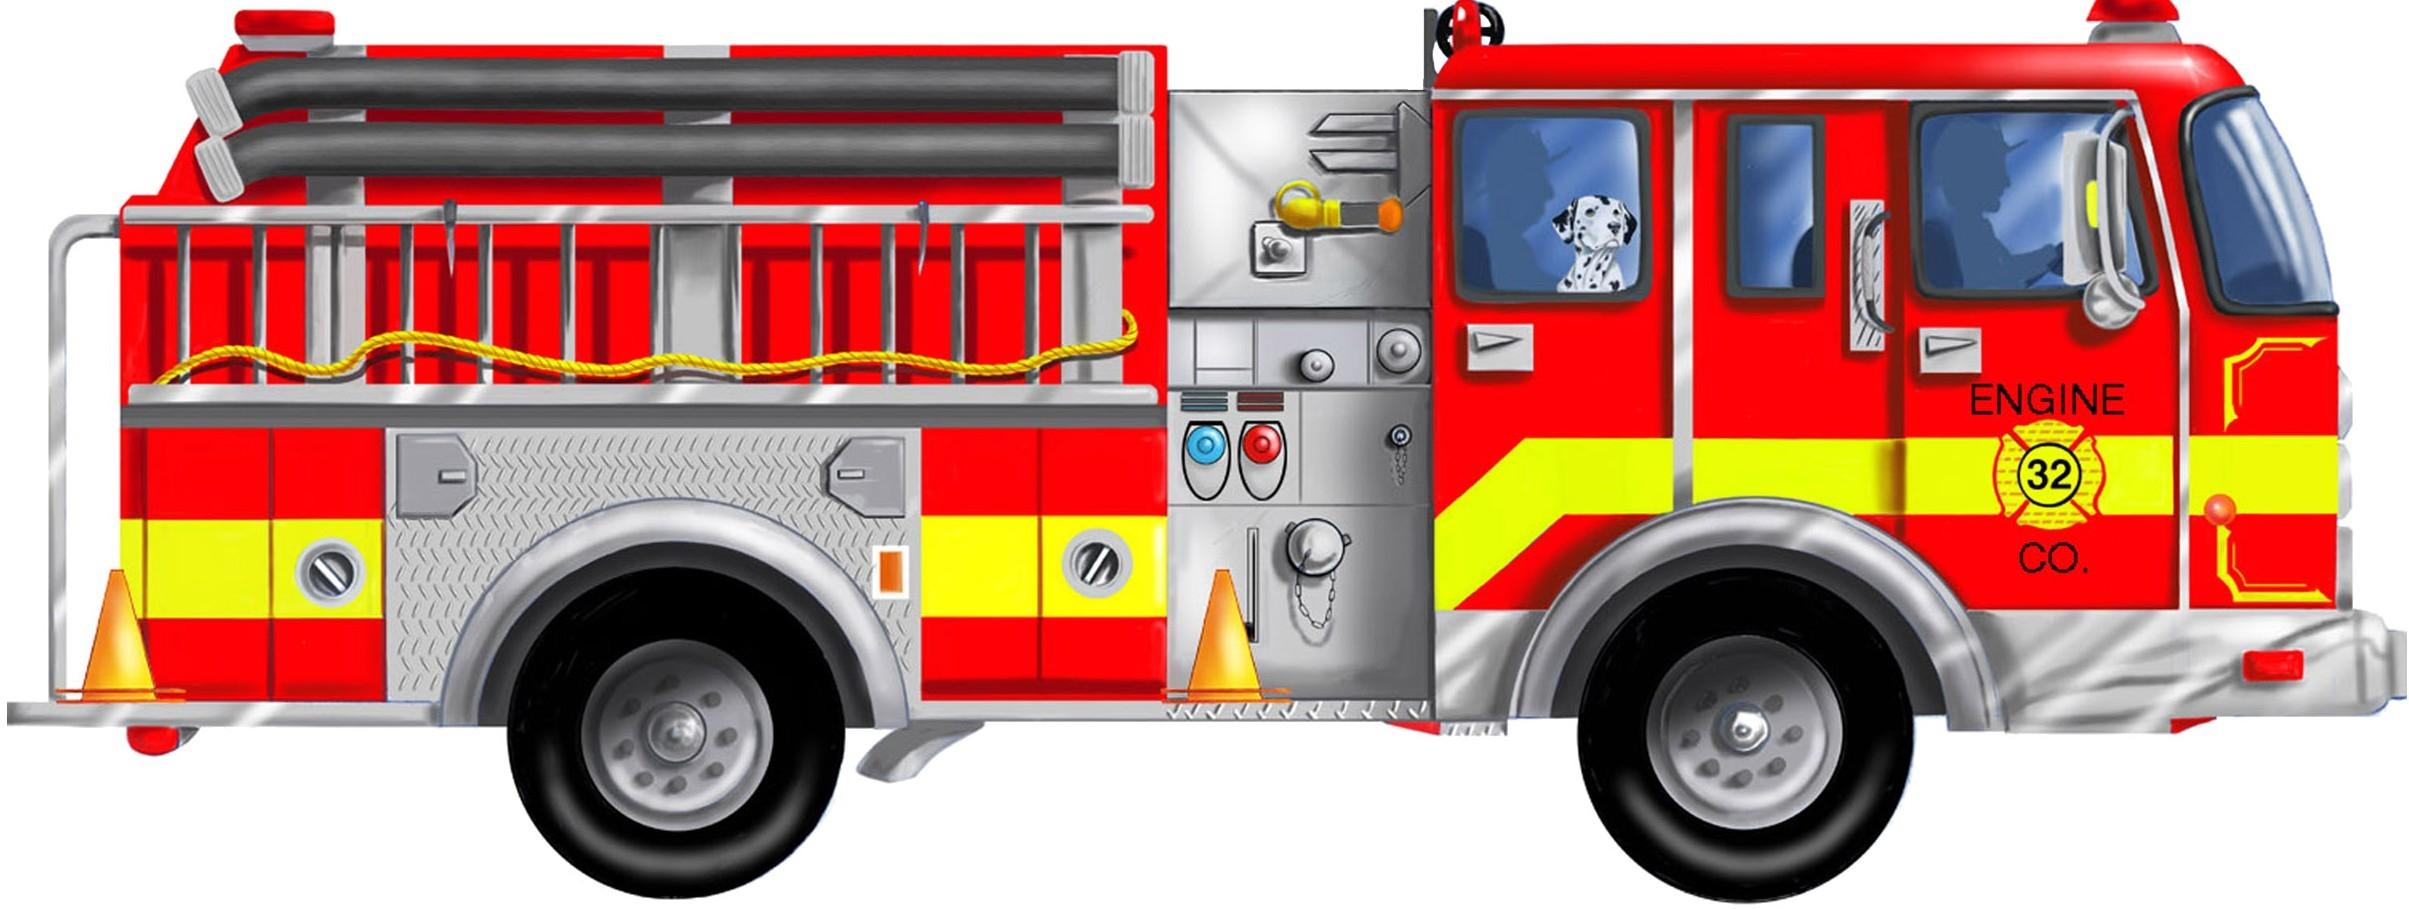 Fire truck truck parts clipart-Fire truck truck parts clipart-13